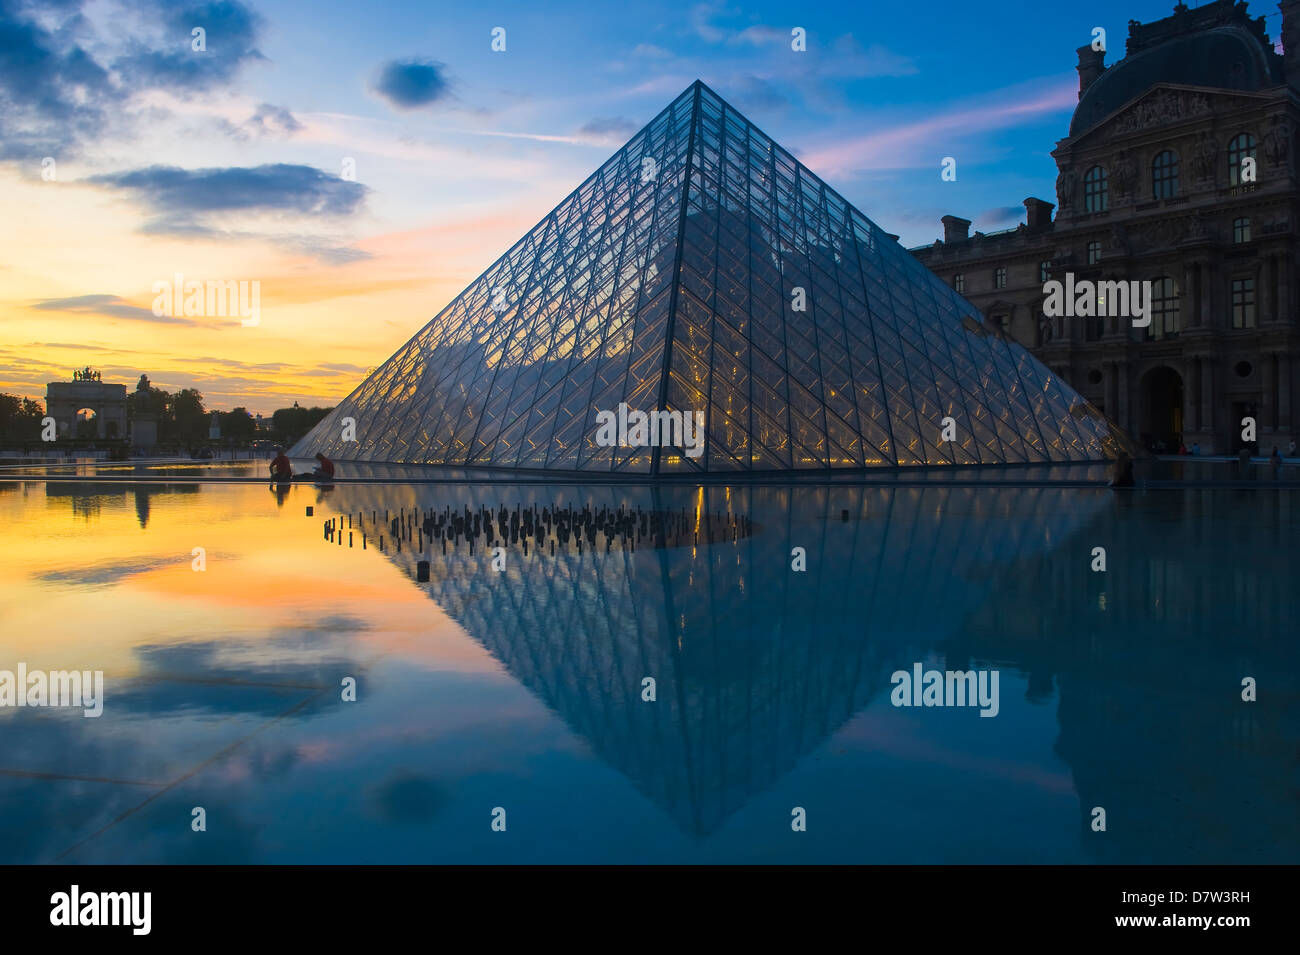 Louvre-Pyramide bei Sonnenuntergang, Paris, Frankreich Stockfoto